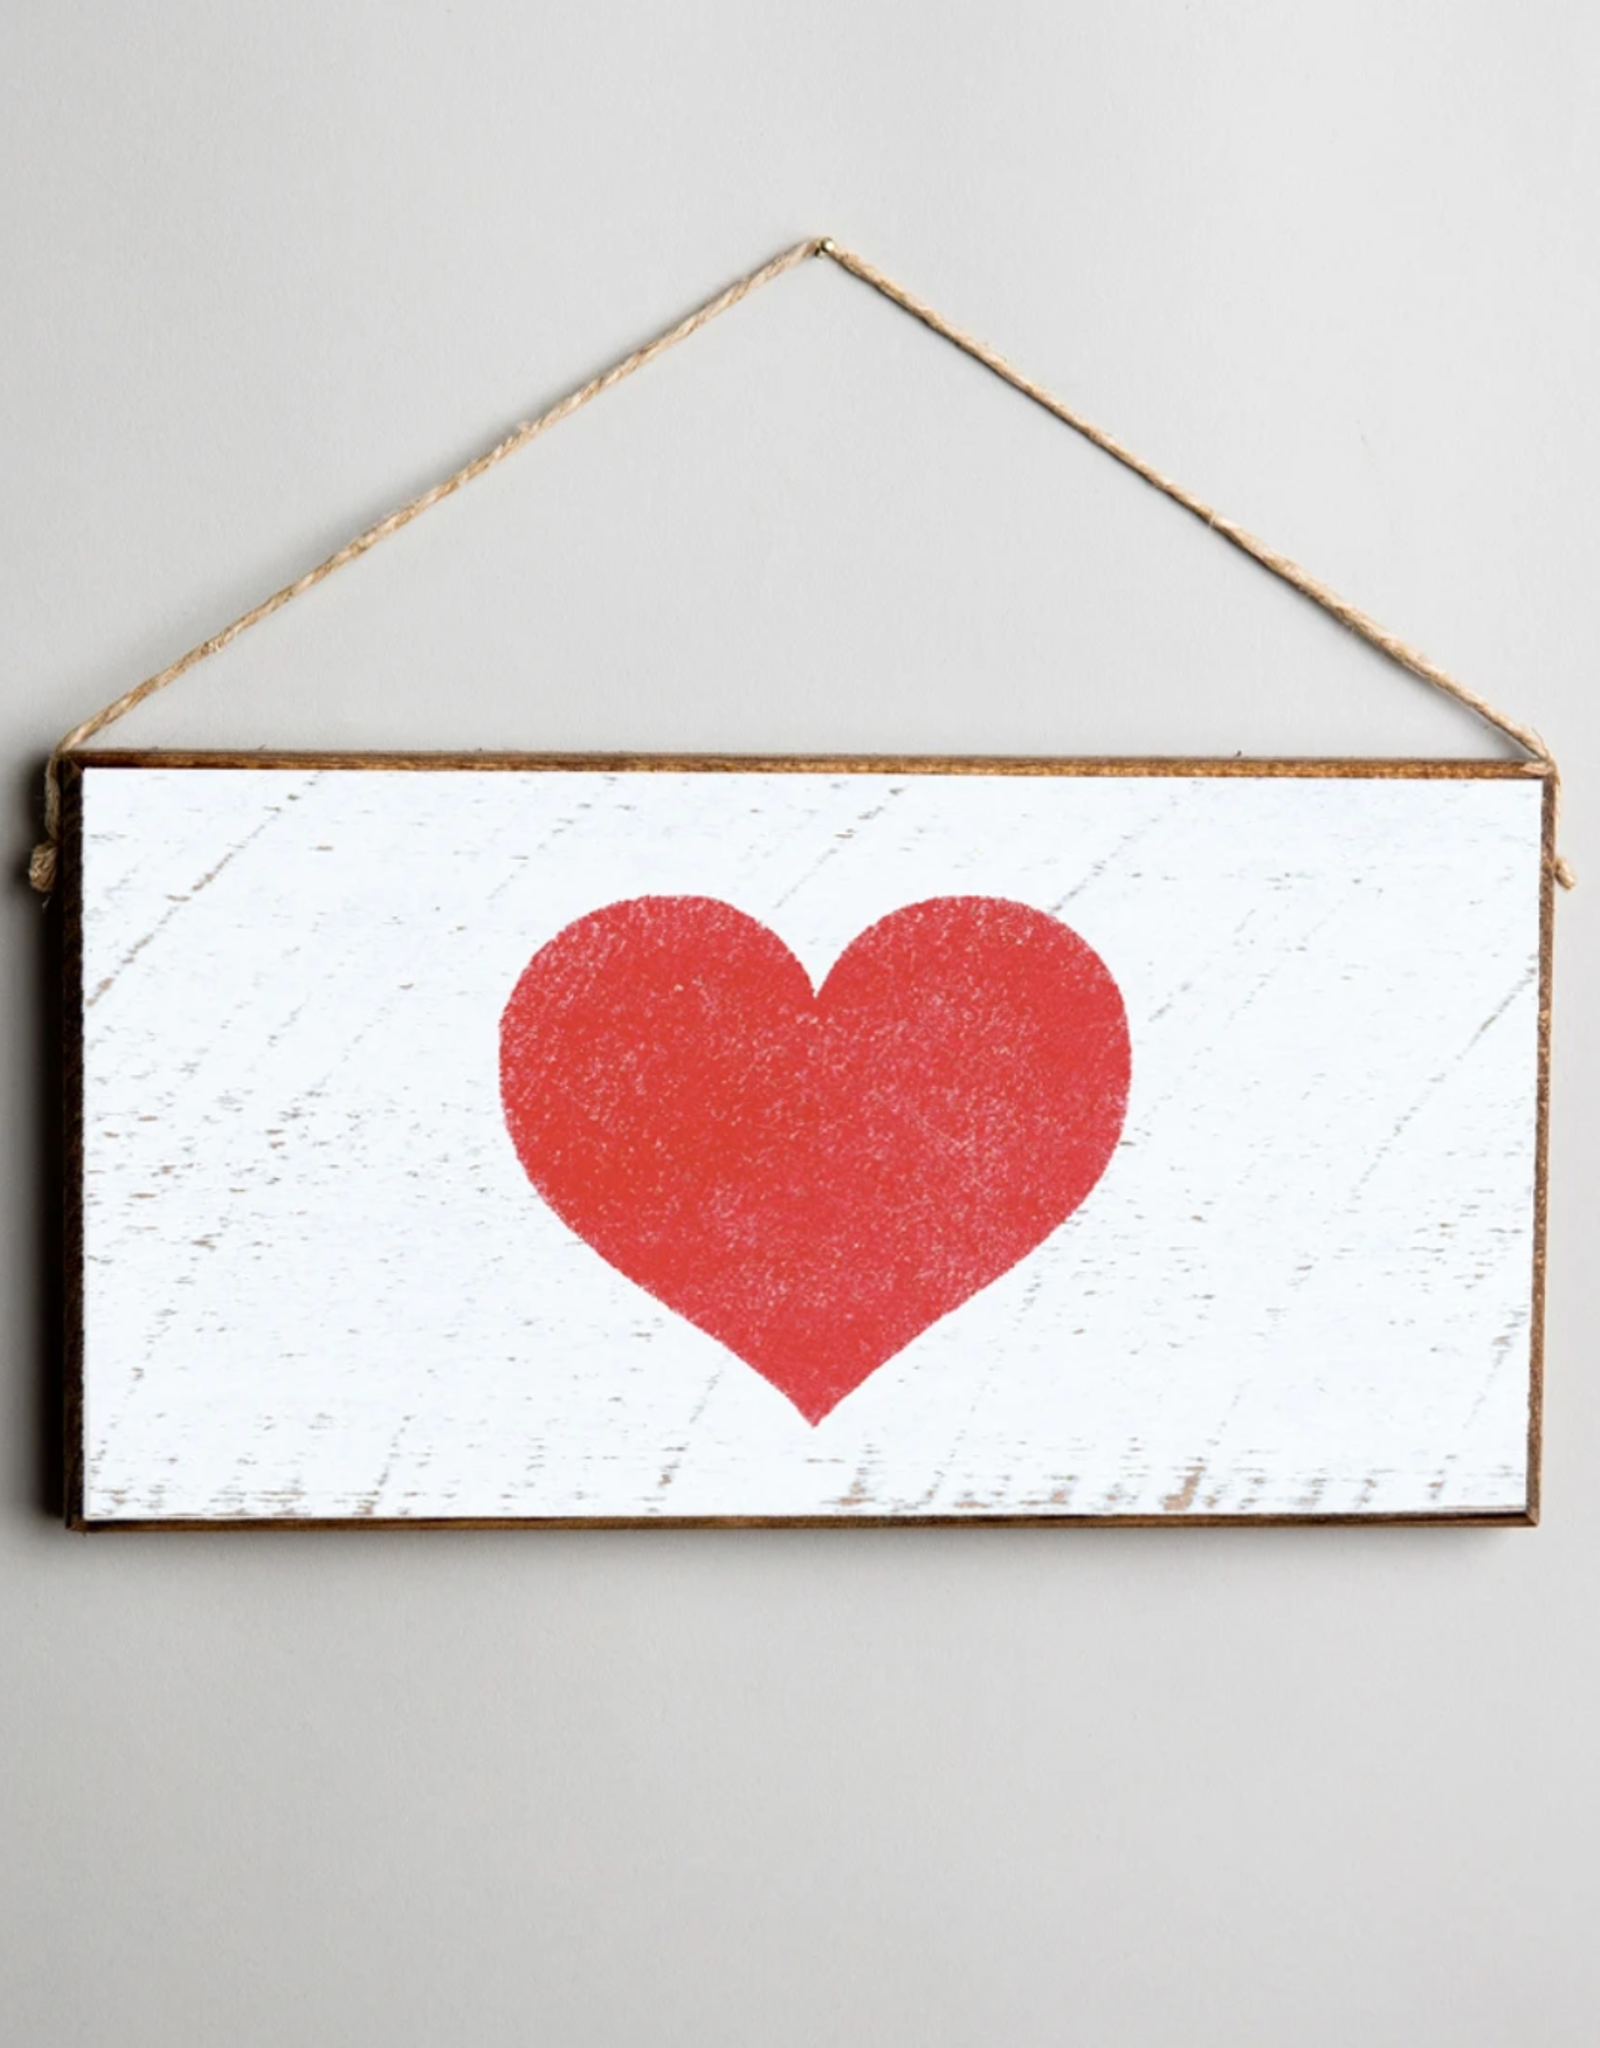 Rustic Marlin Rustic Marlin Mini Plank Heart